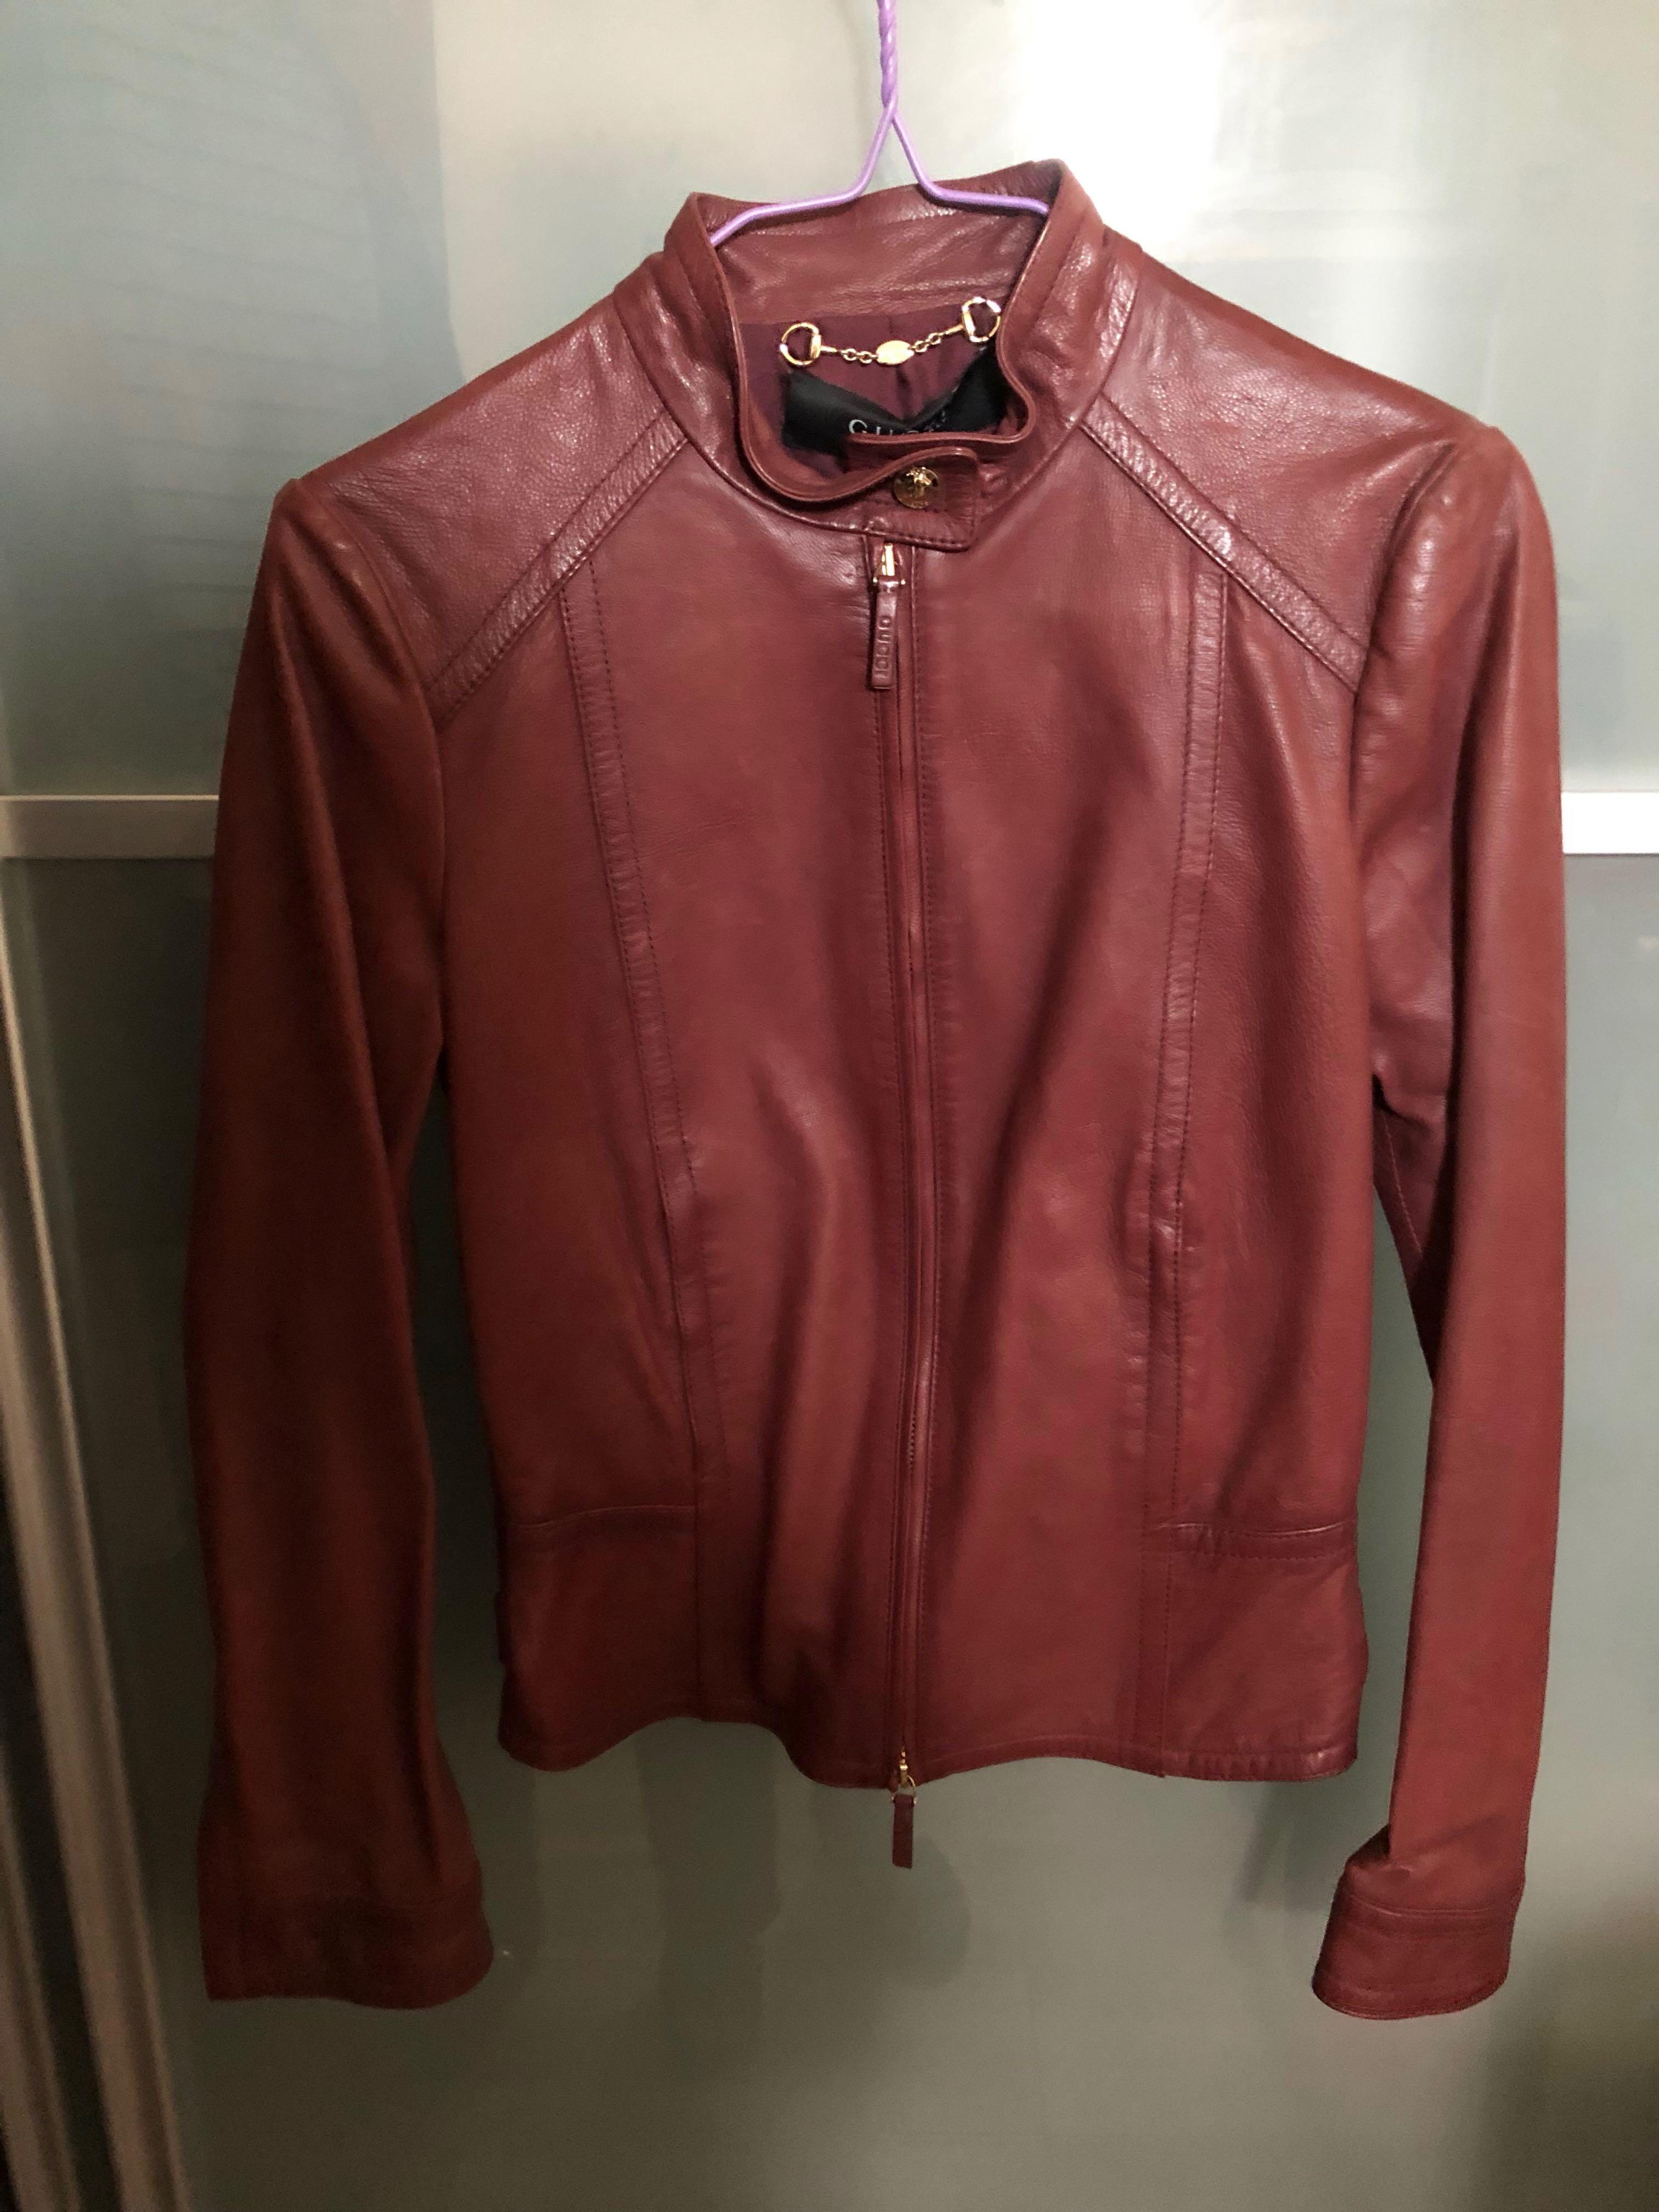 c7c6db36f Gucci 全新棗紅色皮褸size 36 new biker leather jacket, Women's Fashion, Women's  Tops on Carousell